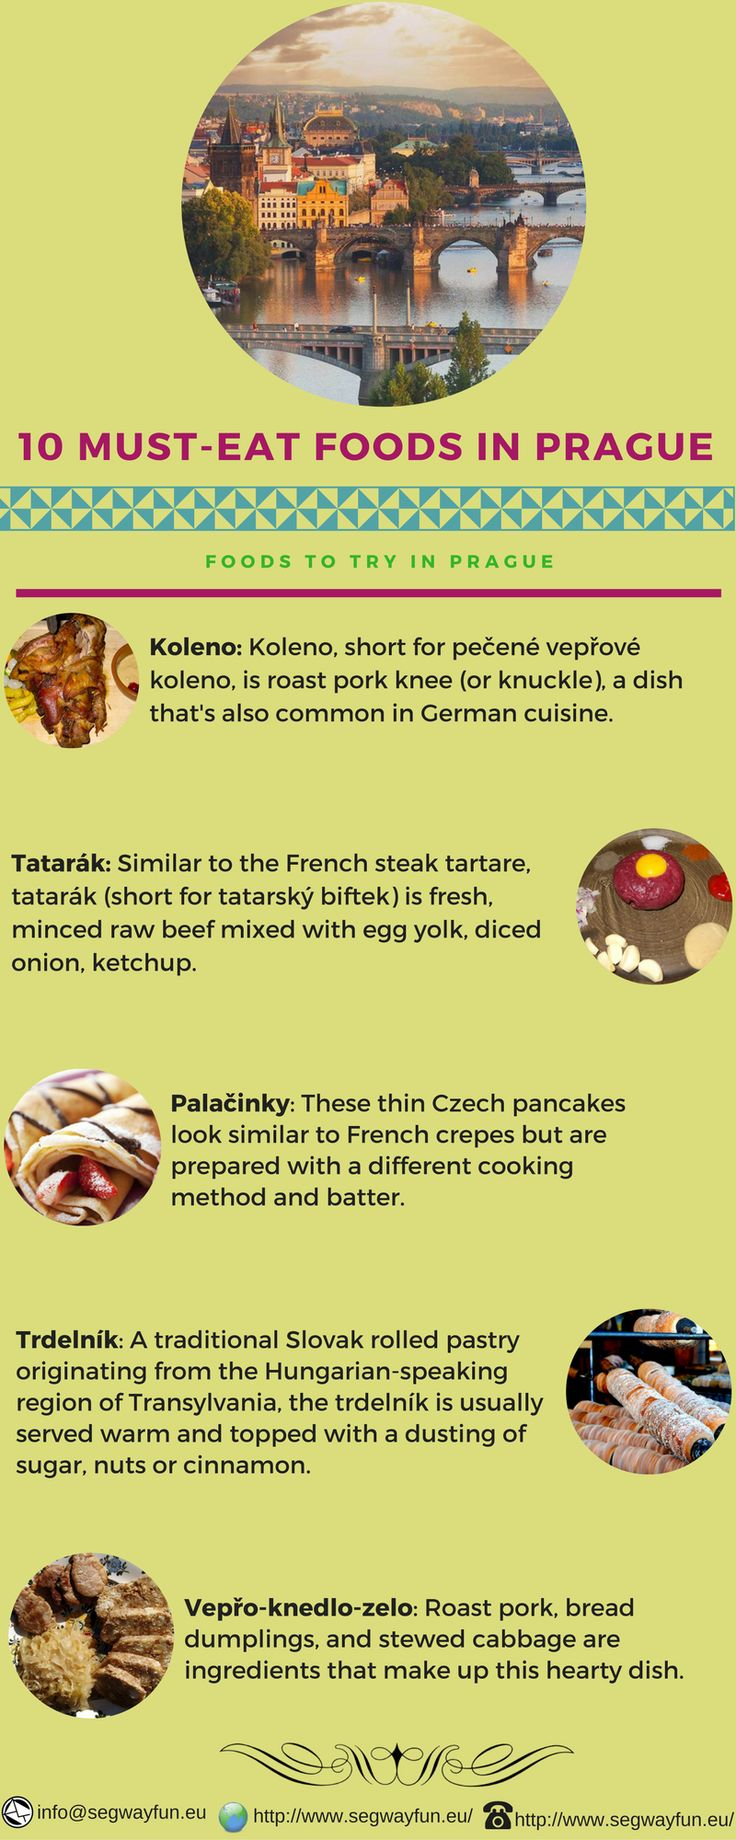 Know the various delicious foods in Prague. #Praguecitytour